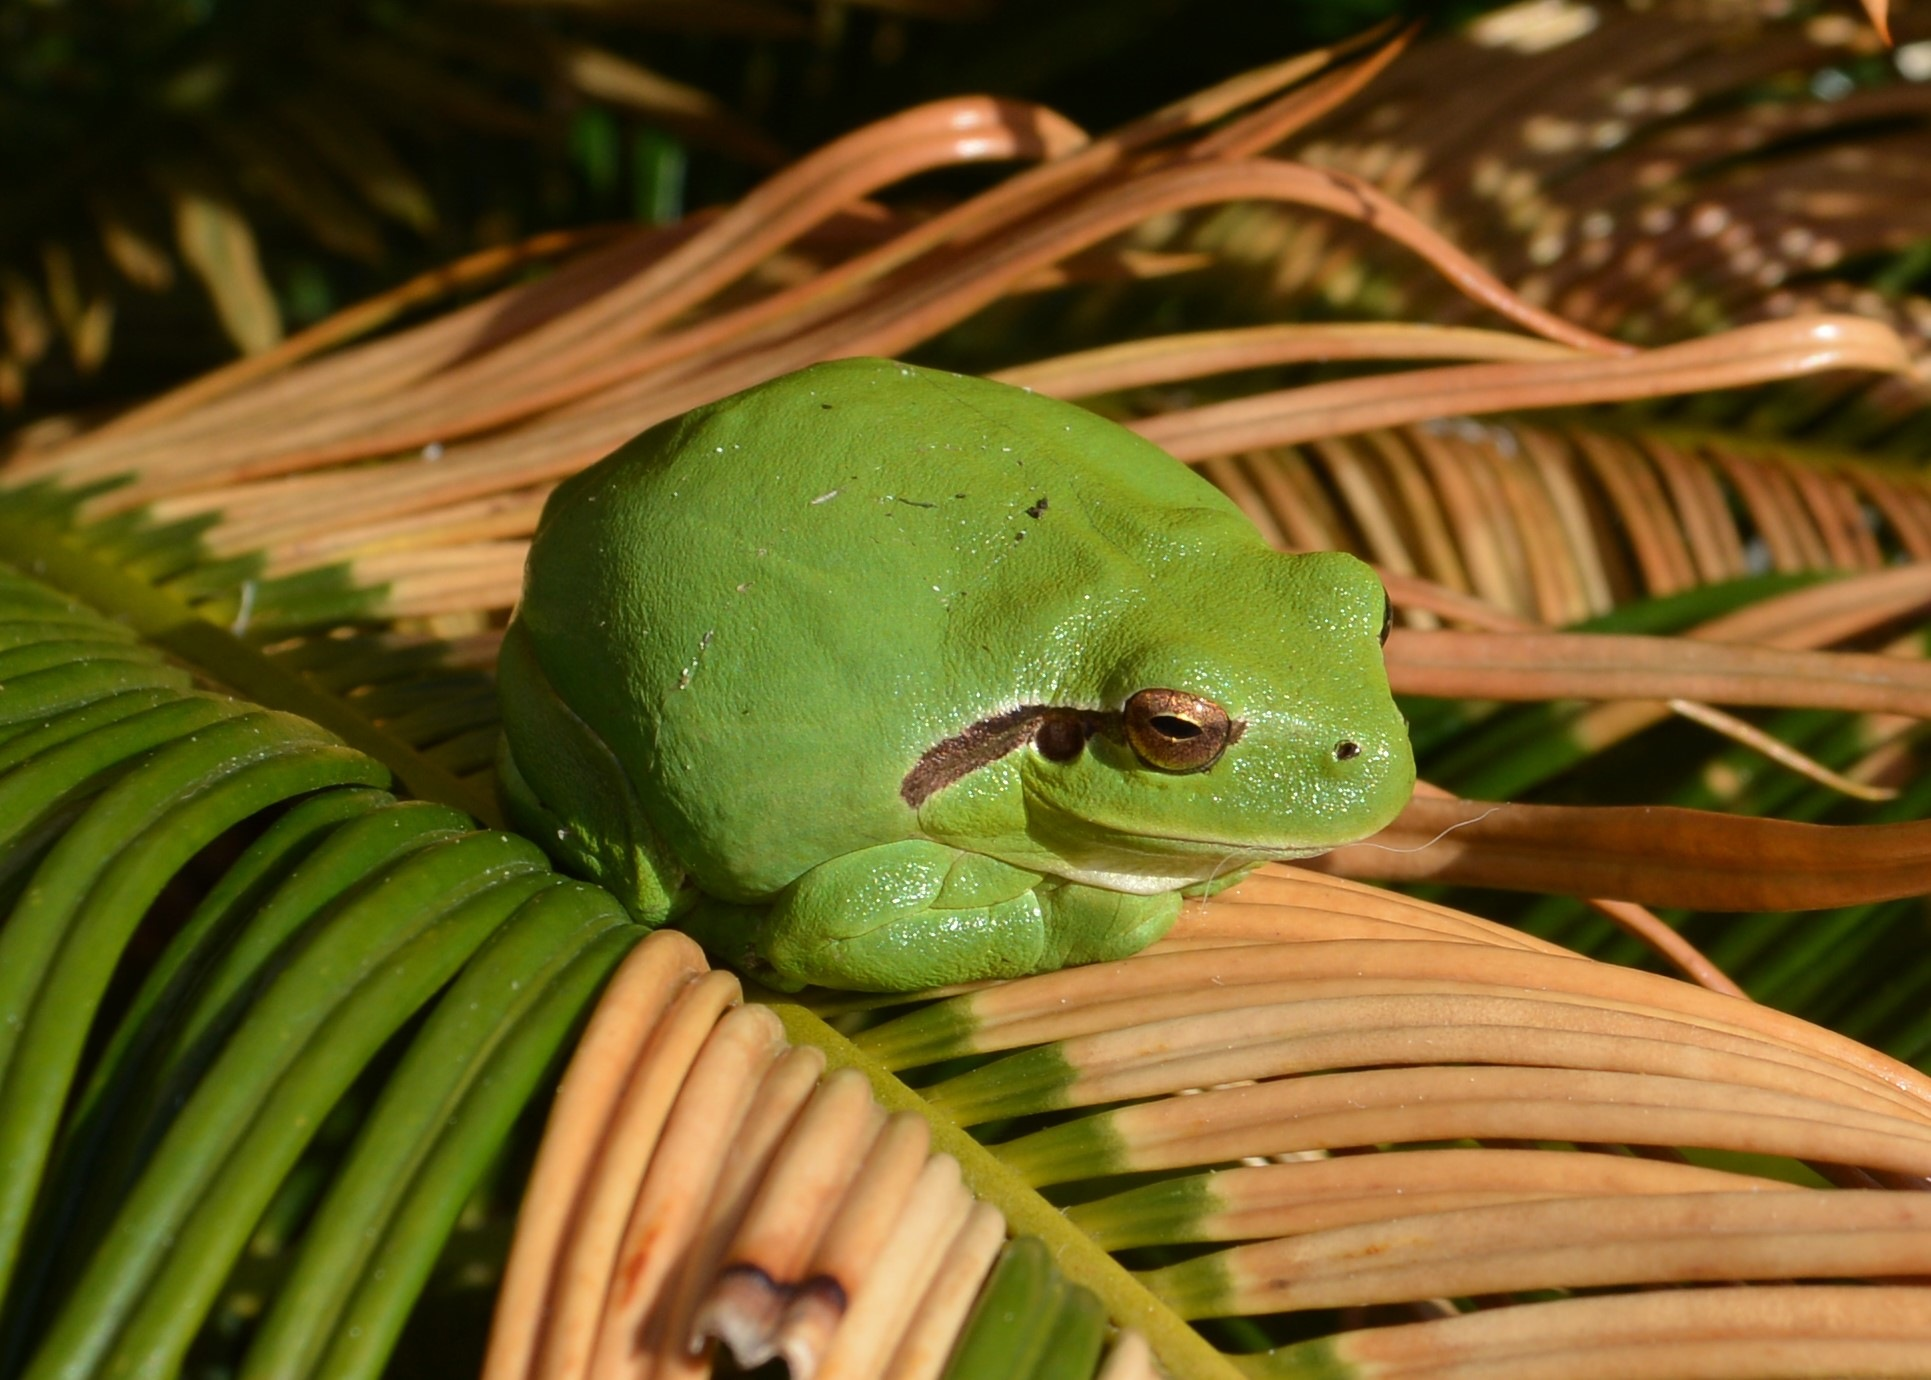 Tree Frog - Reinette by alison16